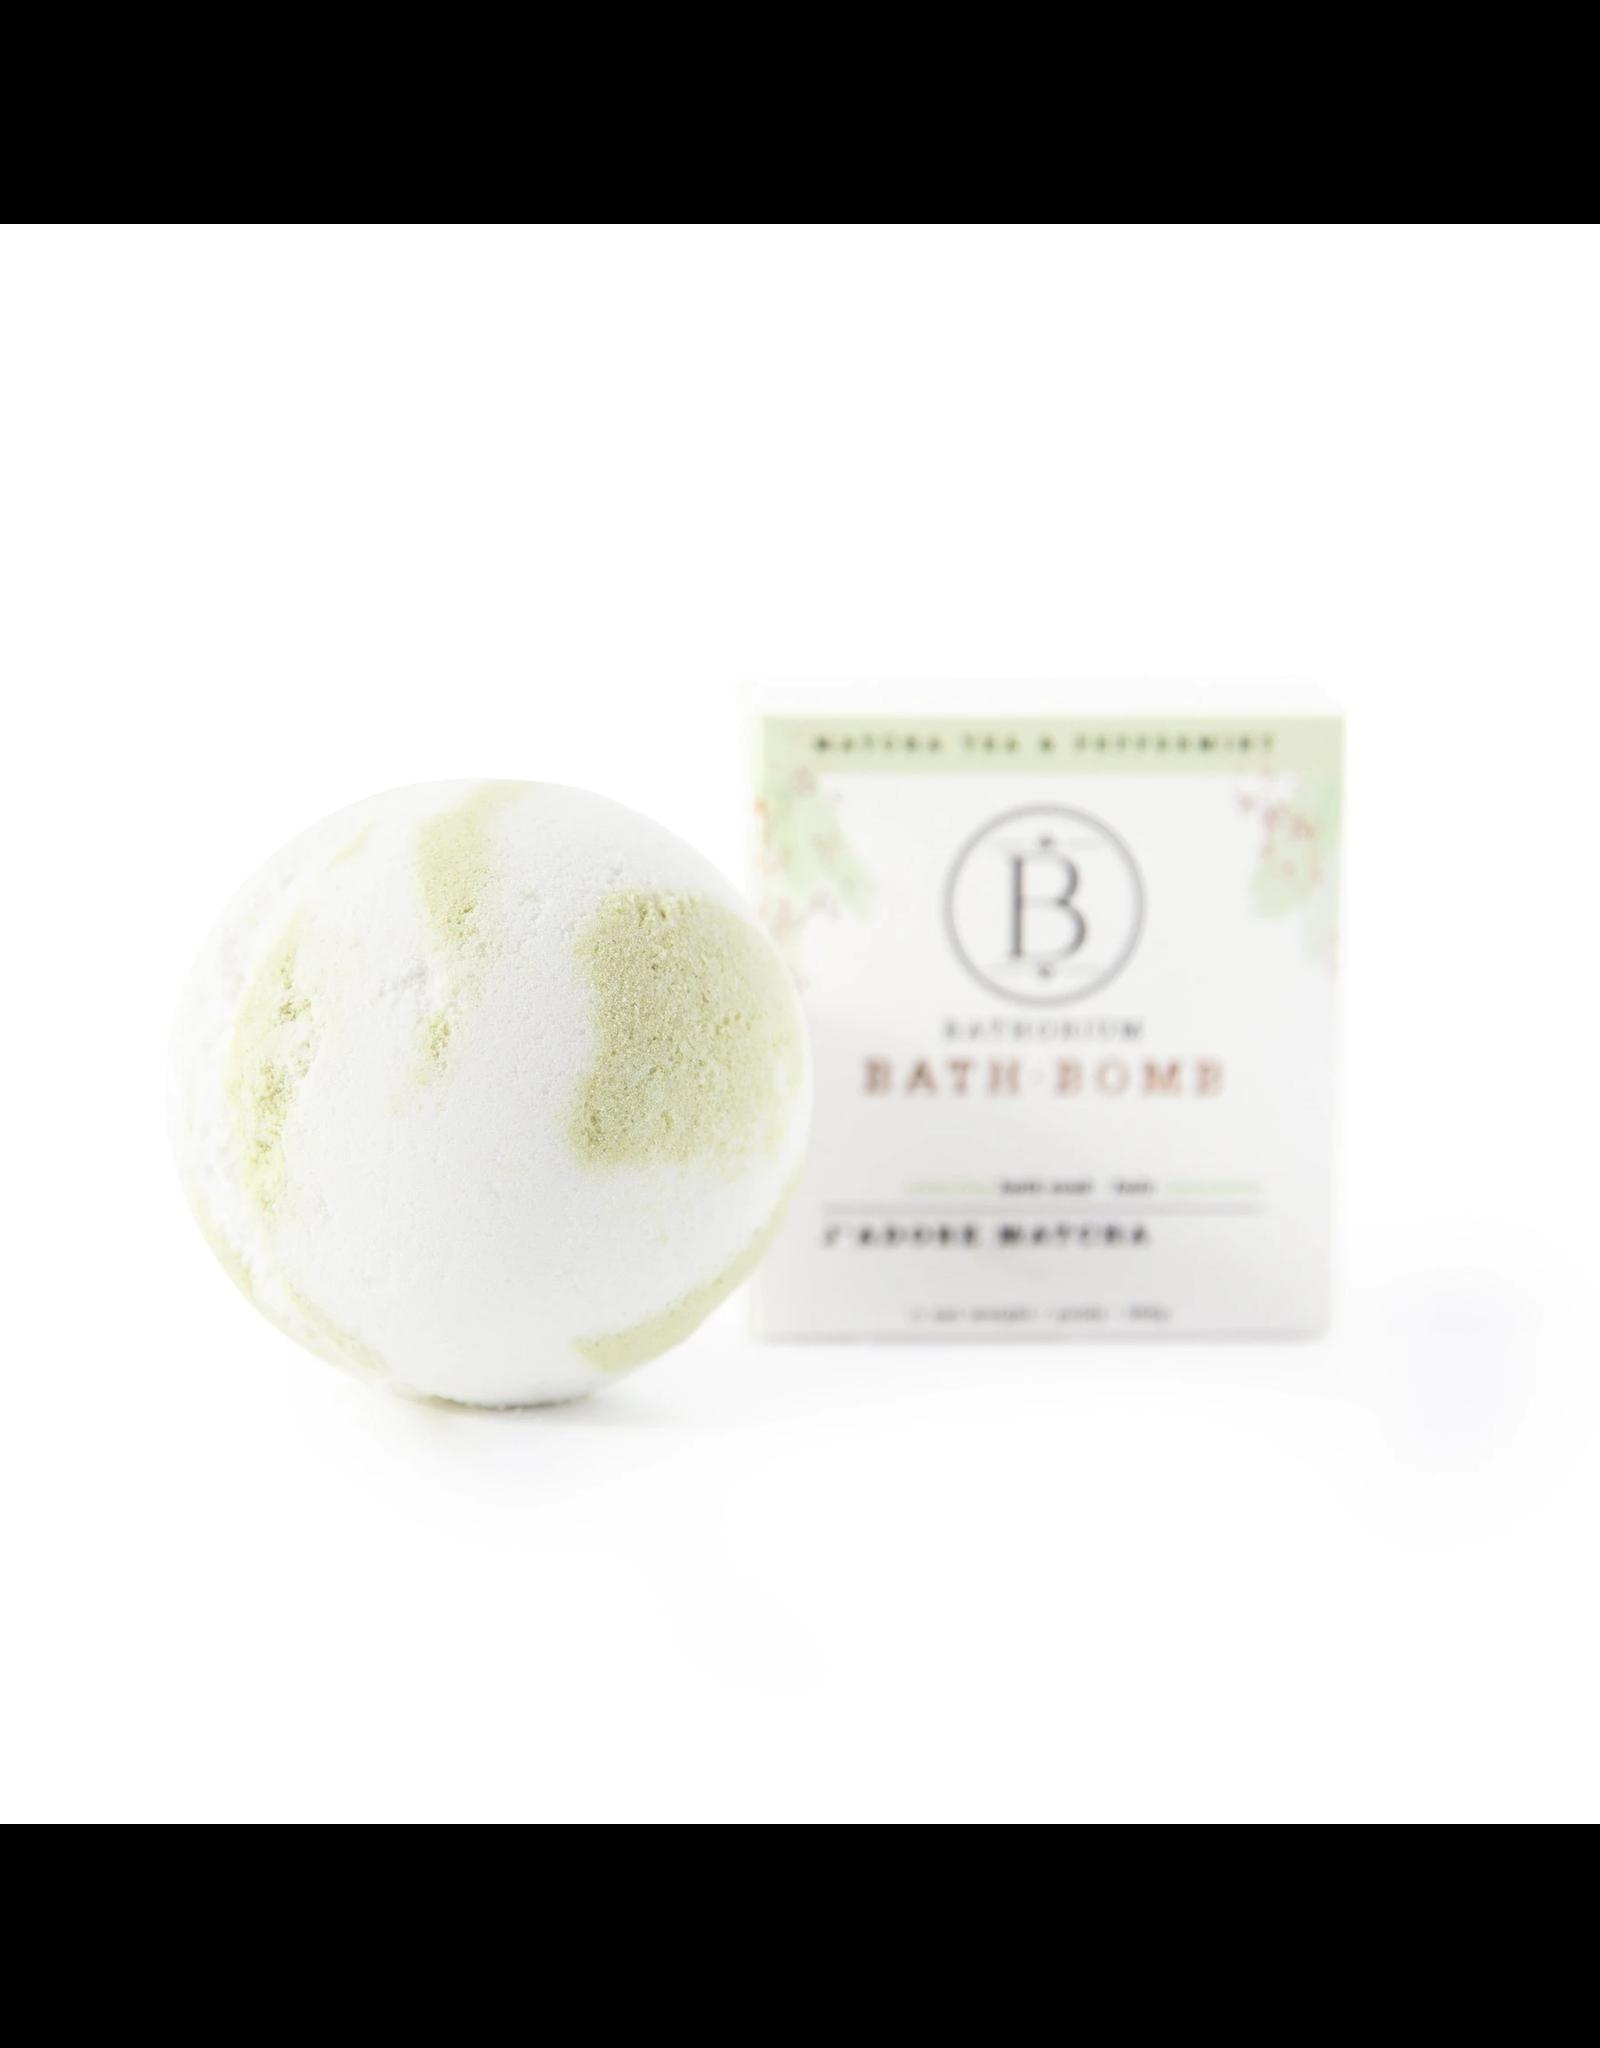 Bathorium Bath Bomb - J'adore Matcha